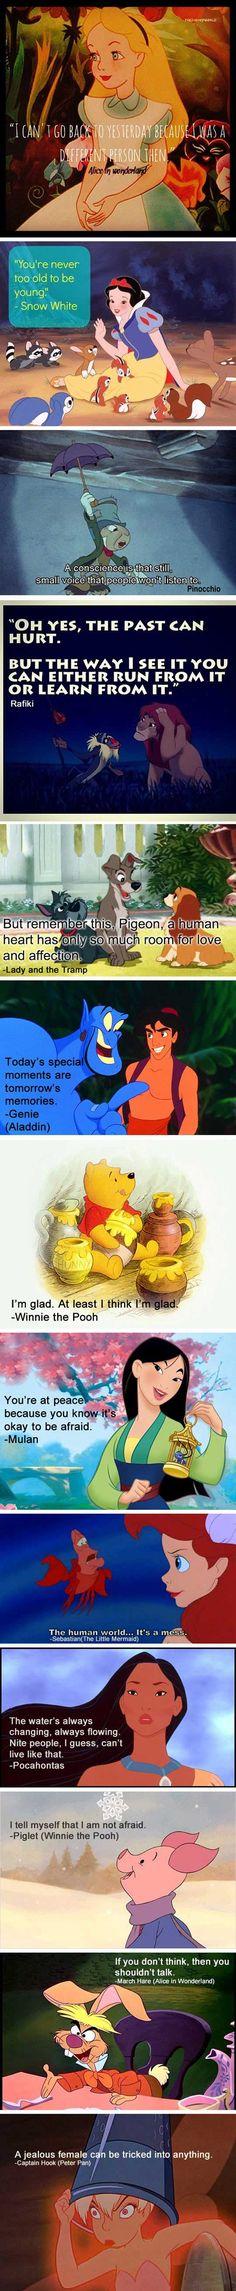 Shockingly profound Disney movies quotes…